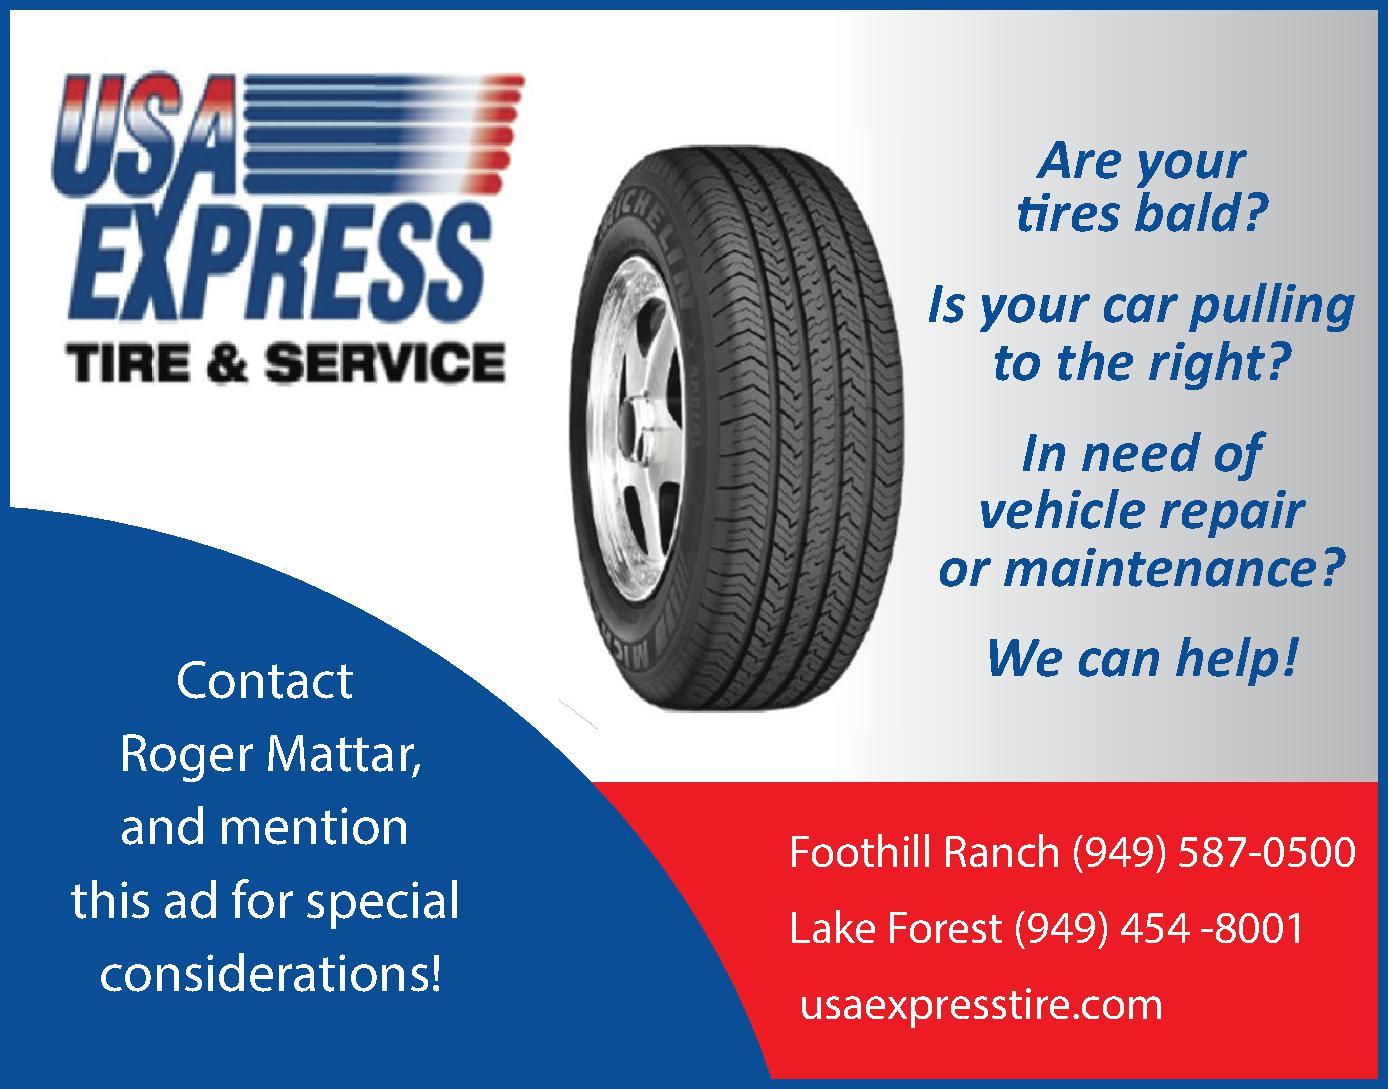 USA Express Tire & Service